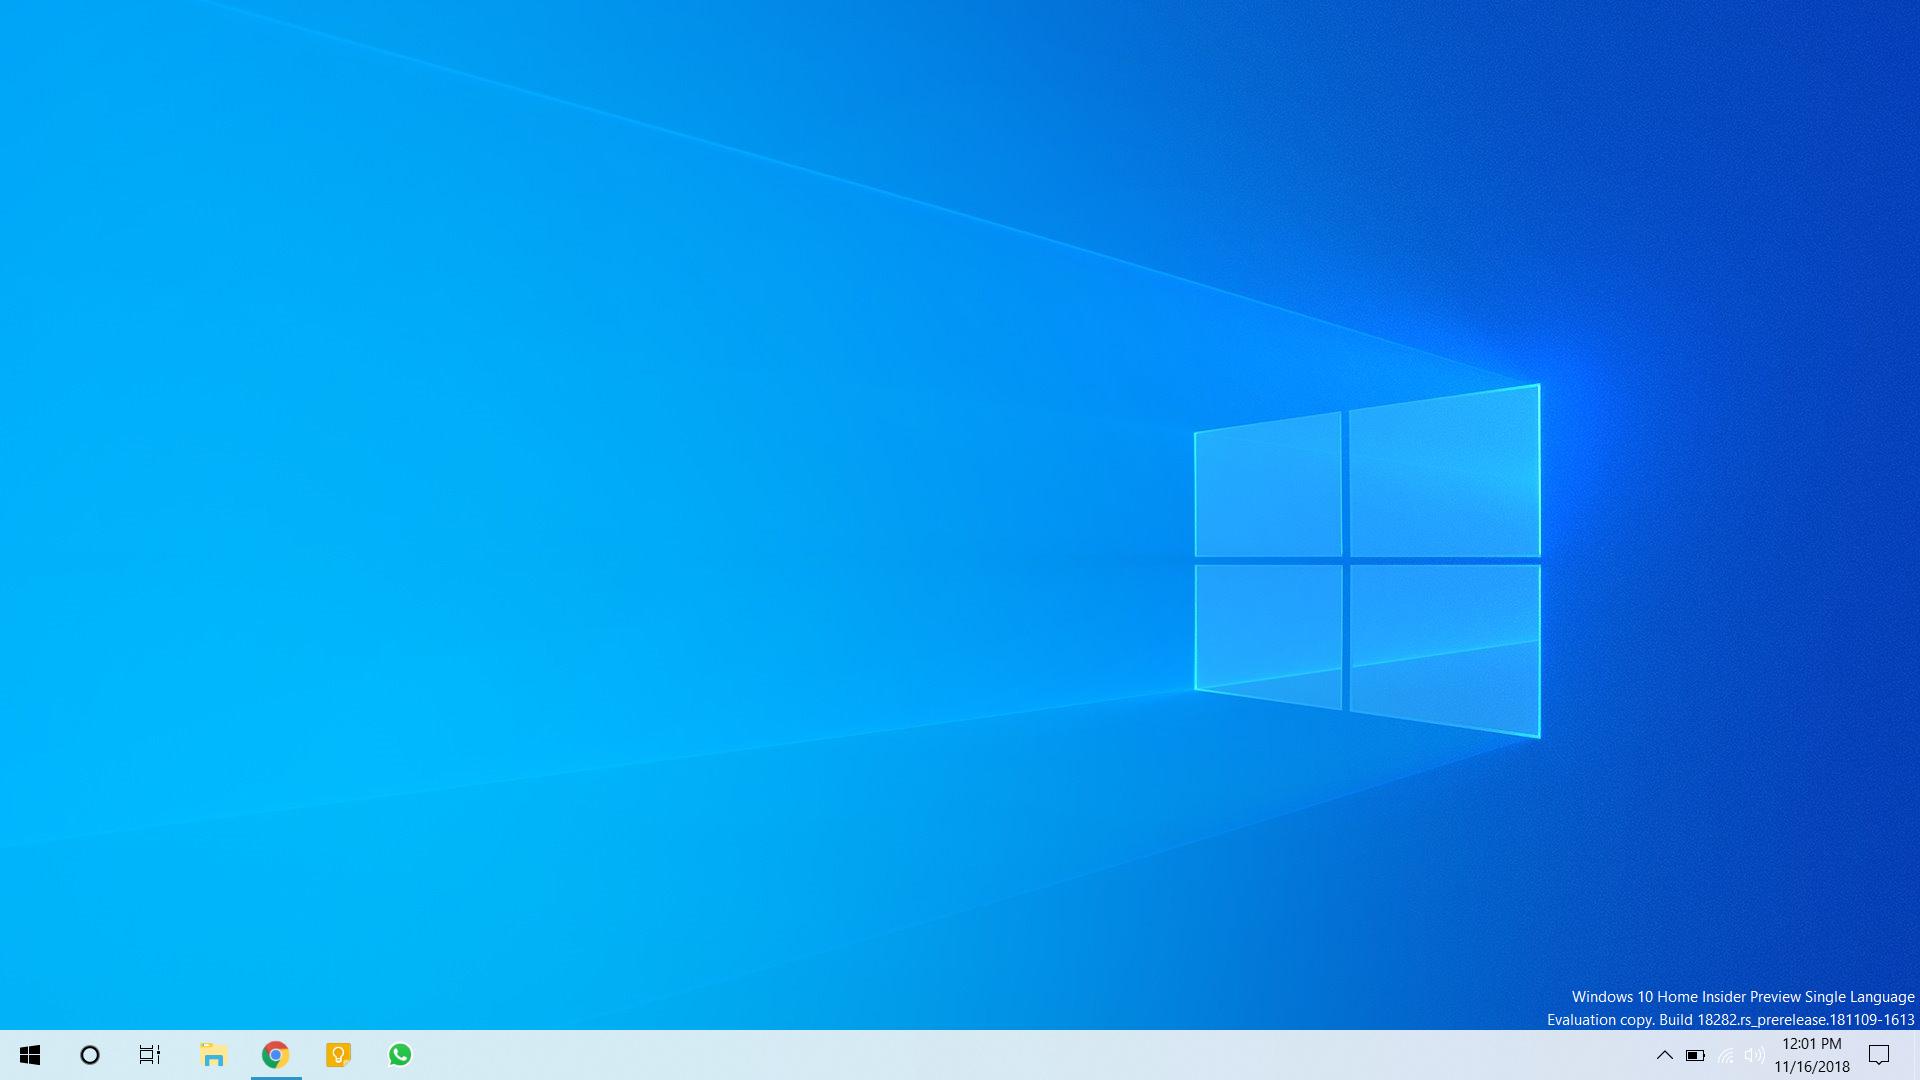 New wallpaper in Windows 10